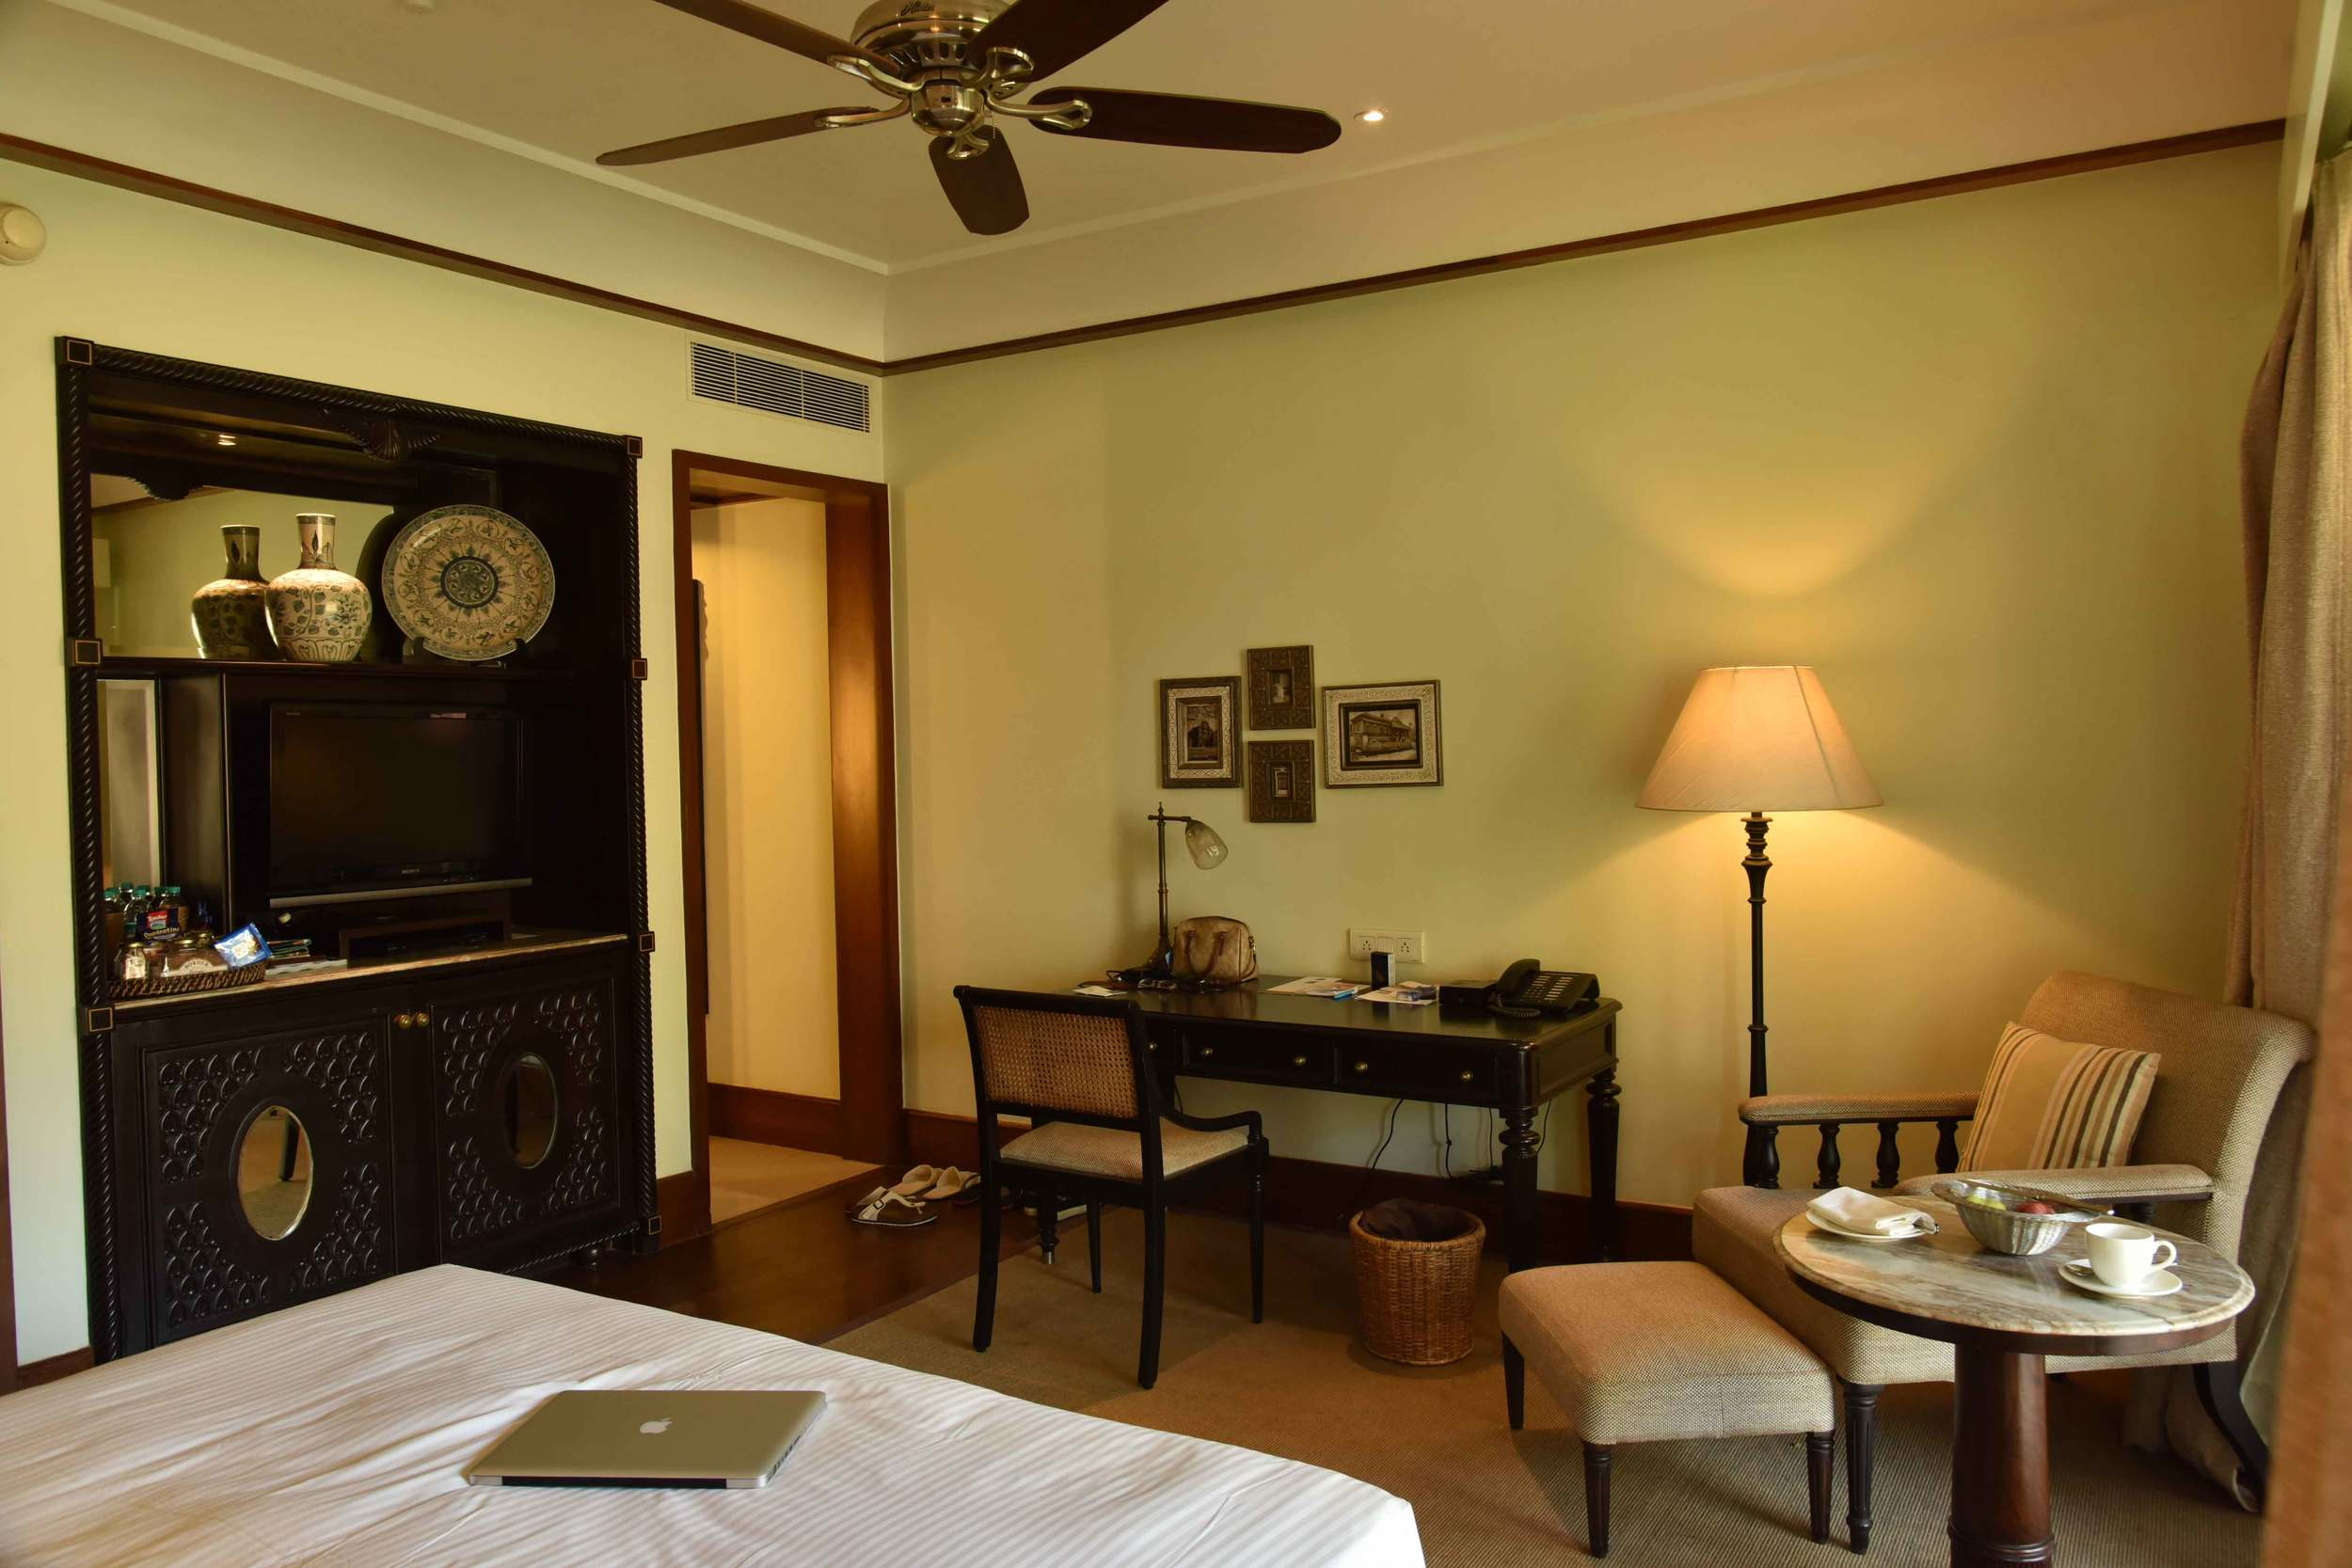 Guest room, Park Hyatt, Goa, India, beach resort, luxury spa resort. Image©thingstodot.com